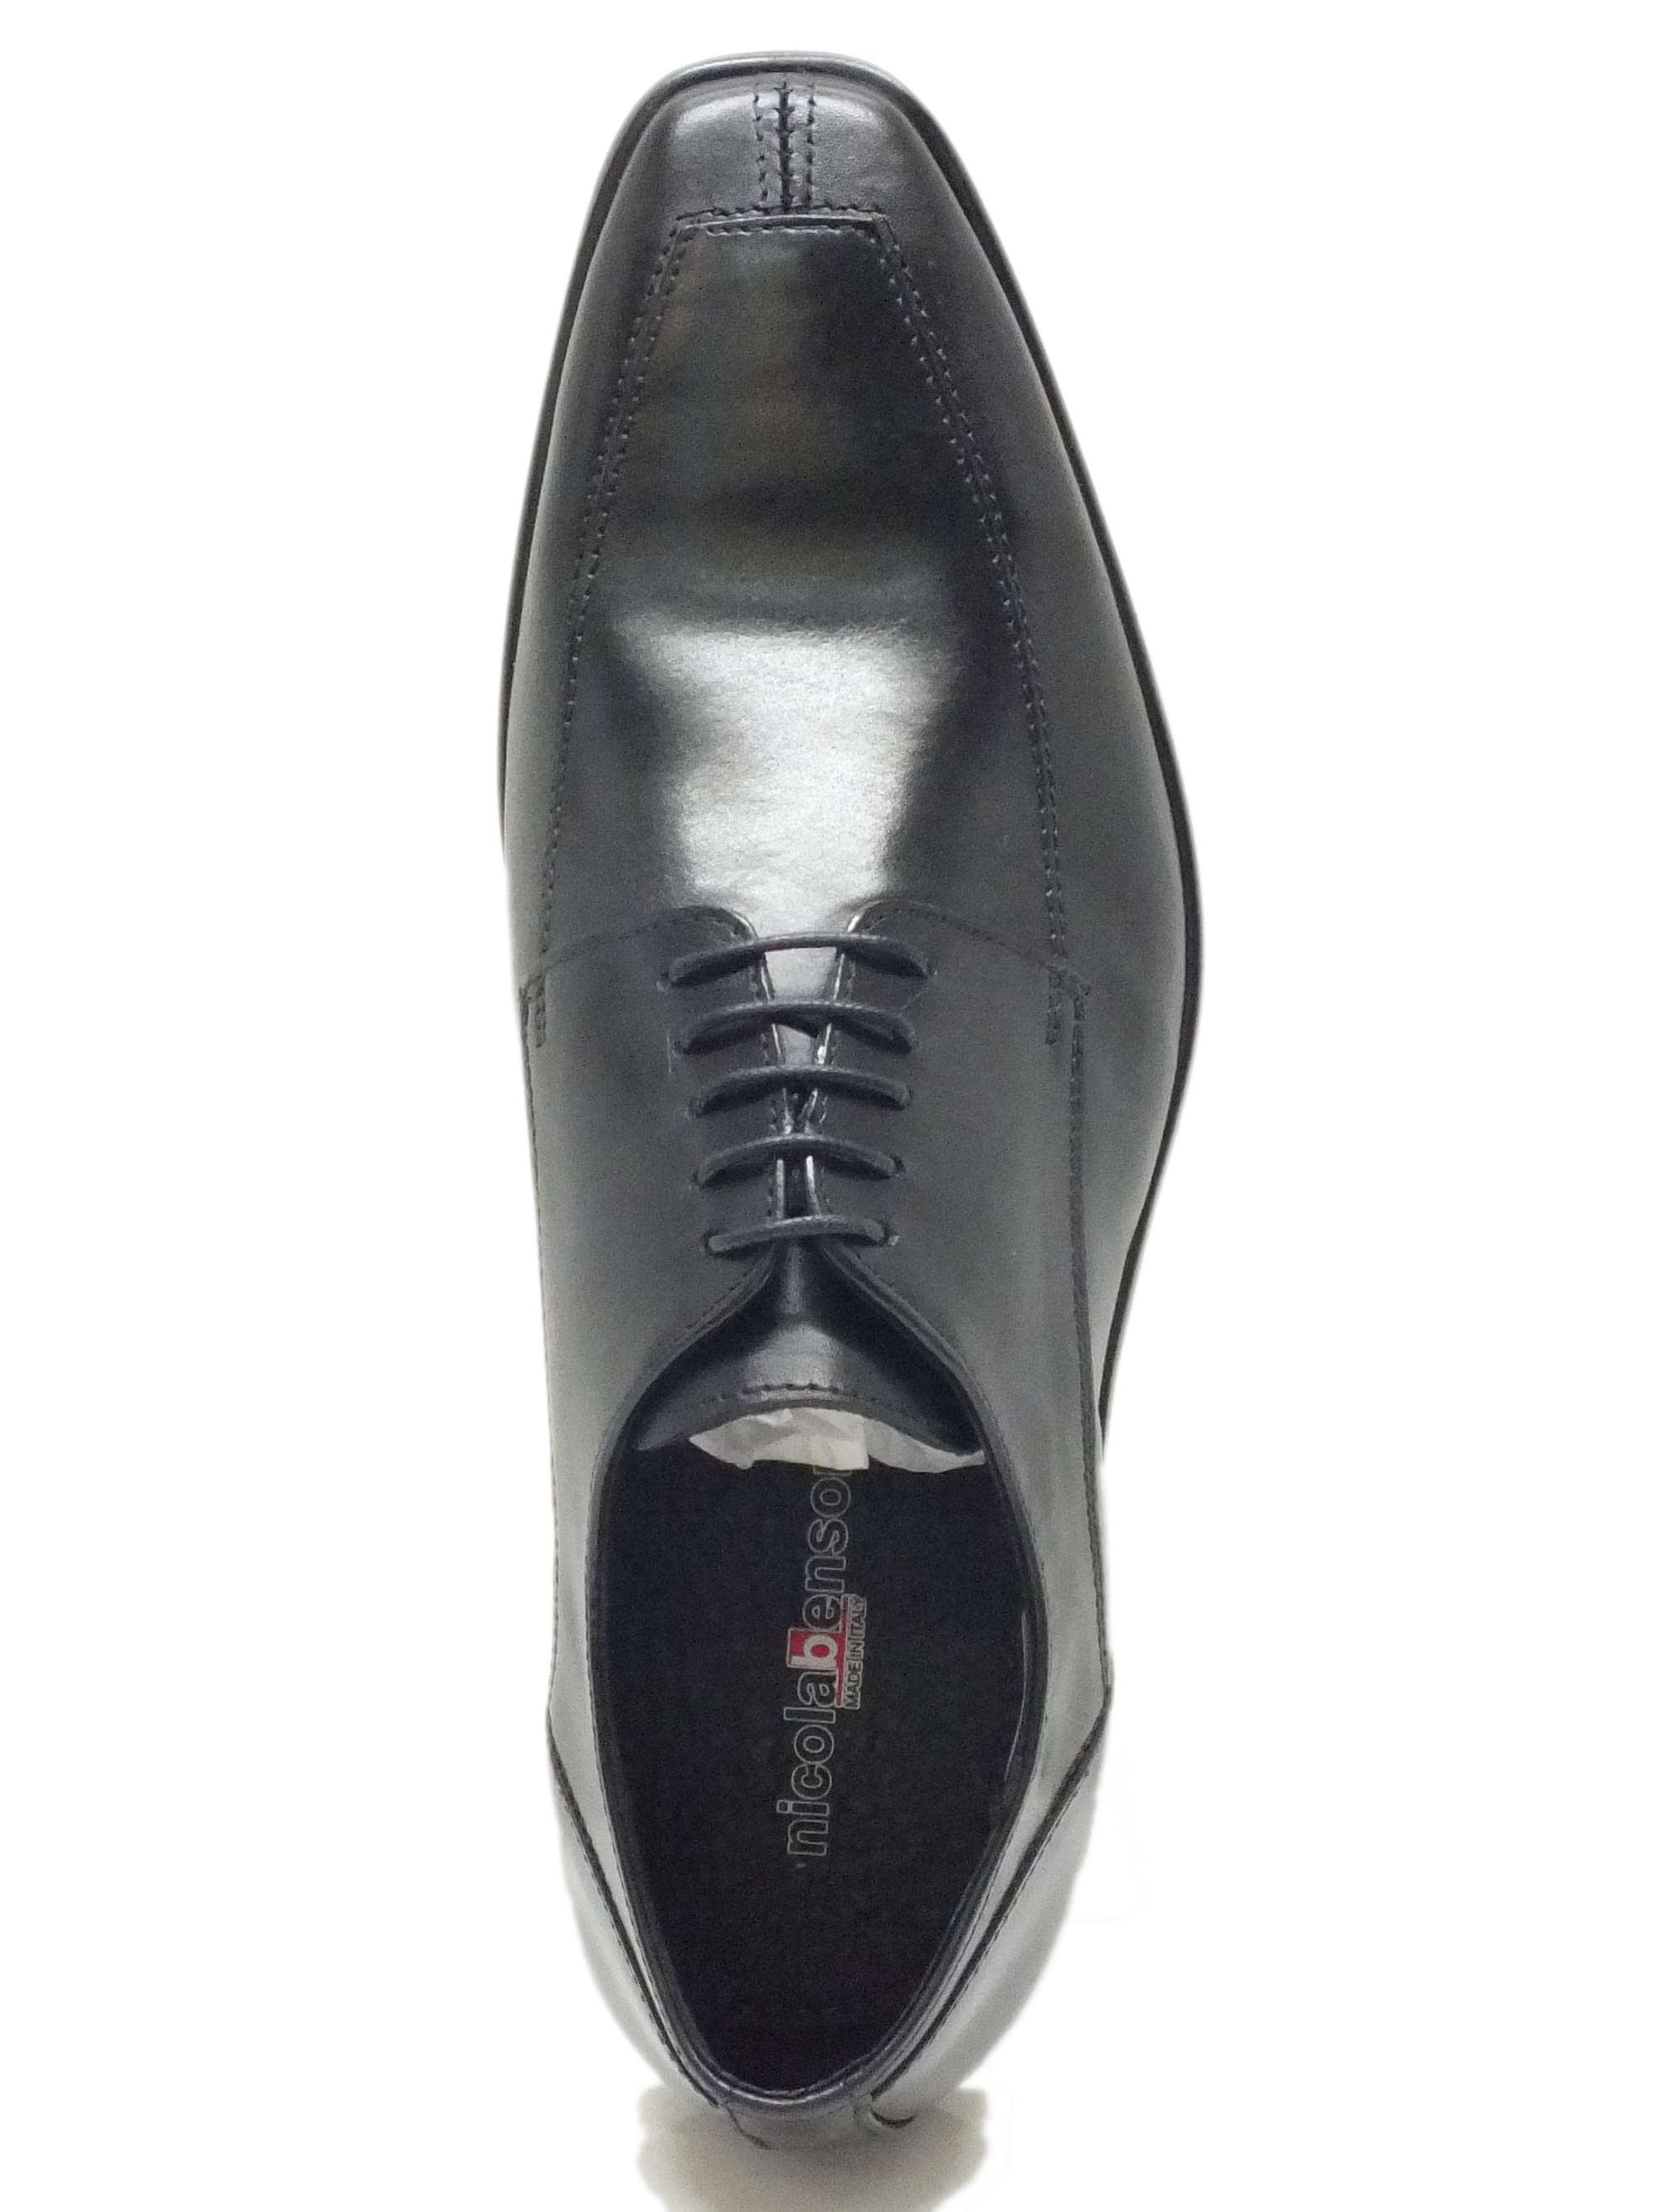 Scarpe eleganti uomo vera pelle nera - Vitiello Calzature 6626bb8c6b7